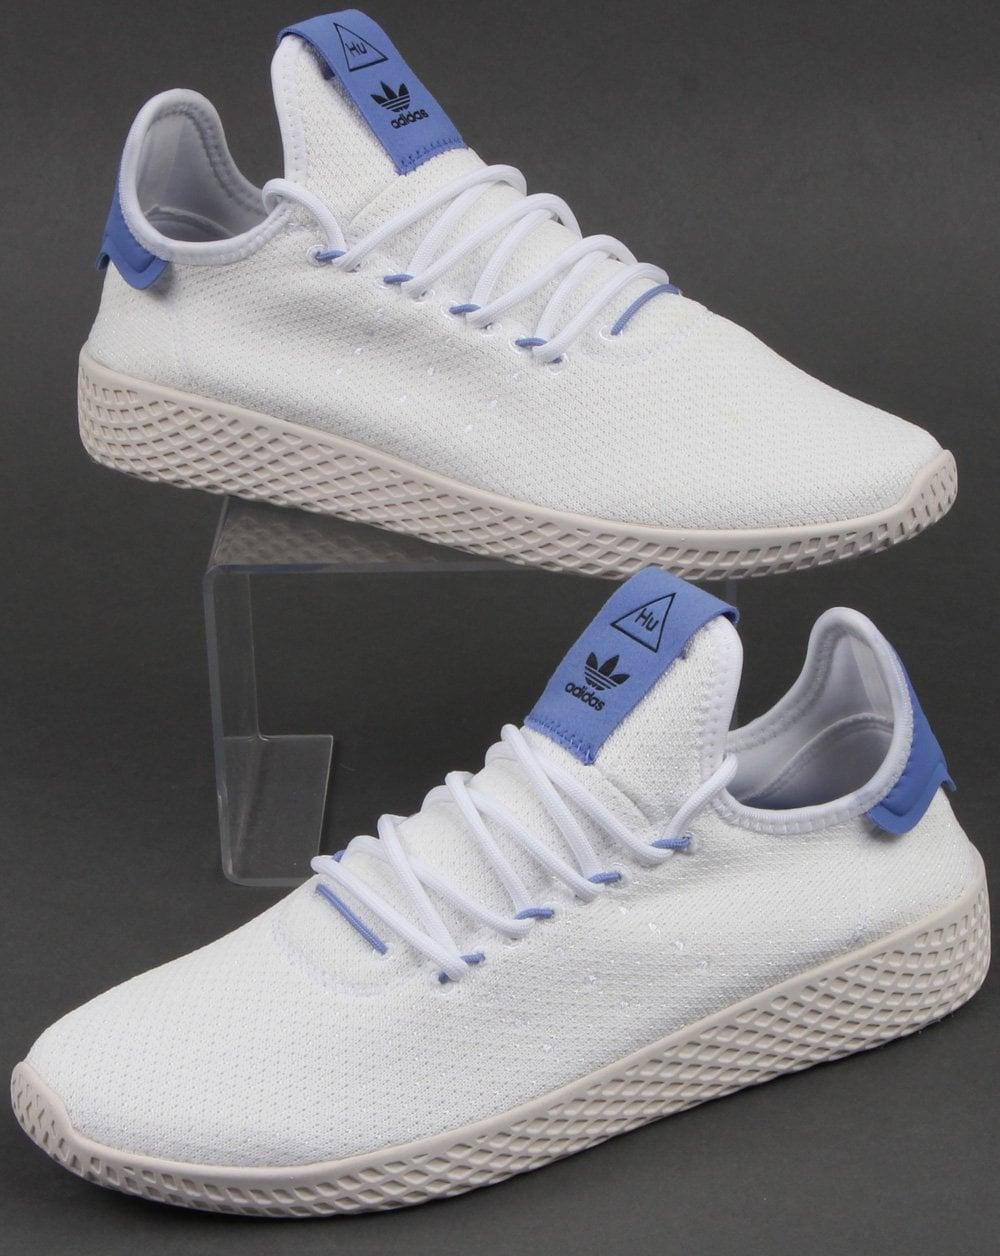 Adidas Pw Tennis Comfort Trainers WhiteLilac